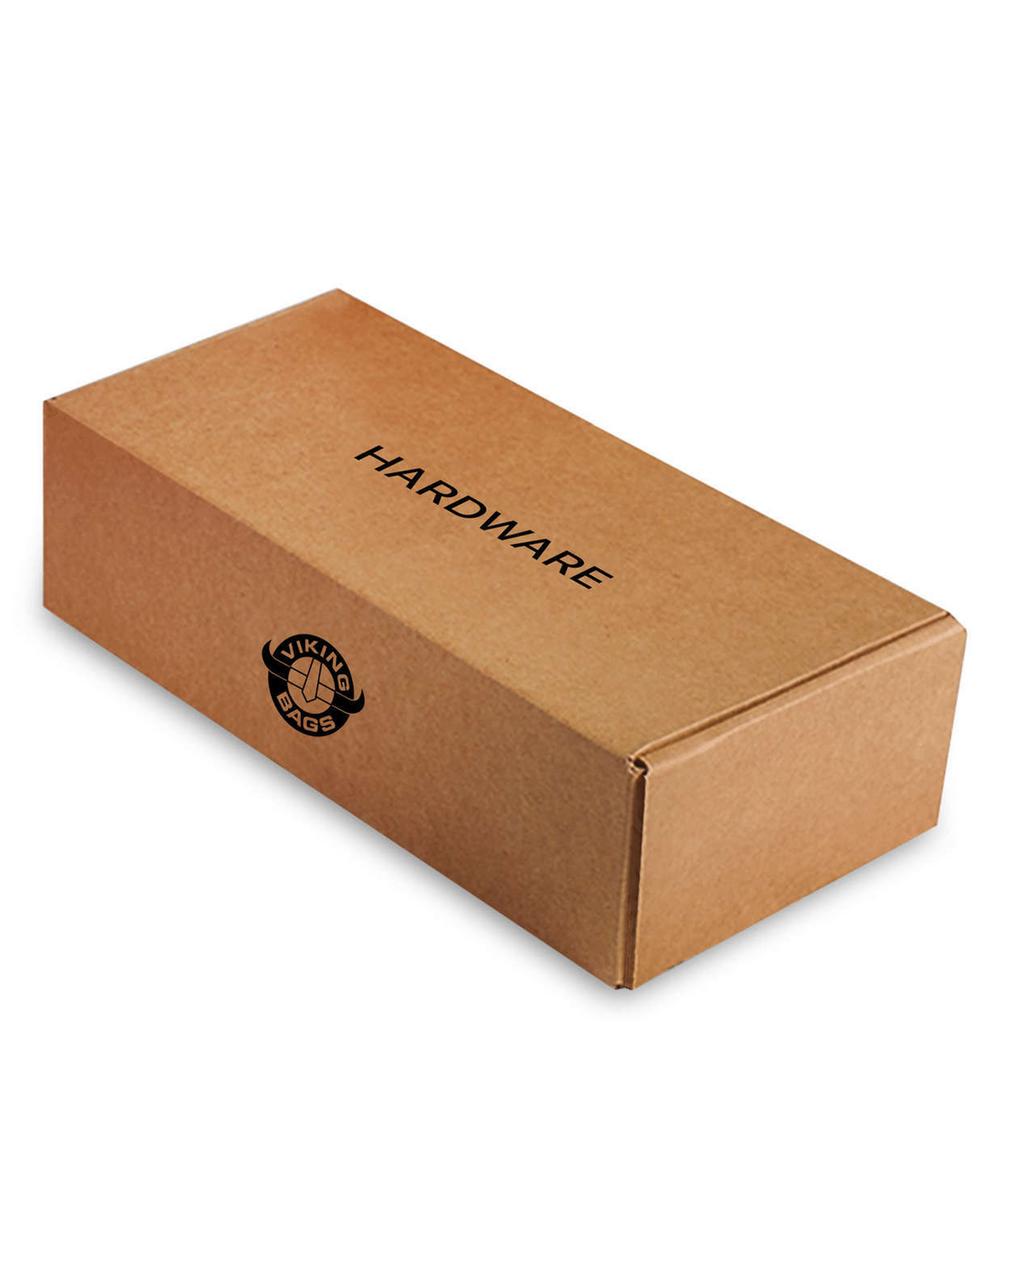 Honda VTX 1800 N Lamellar Extra Large Shock Cutout Leather Covered Saddlebag Box